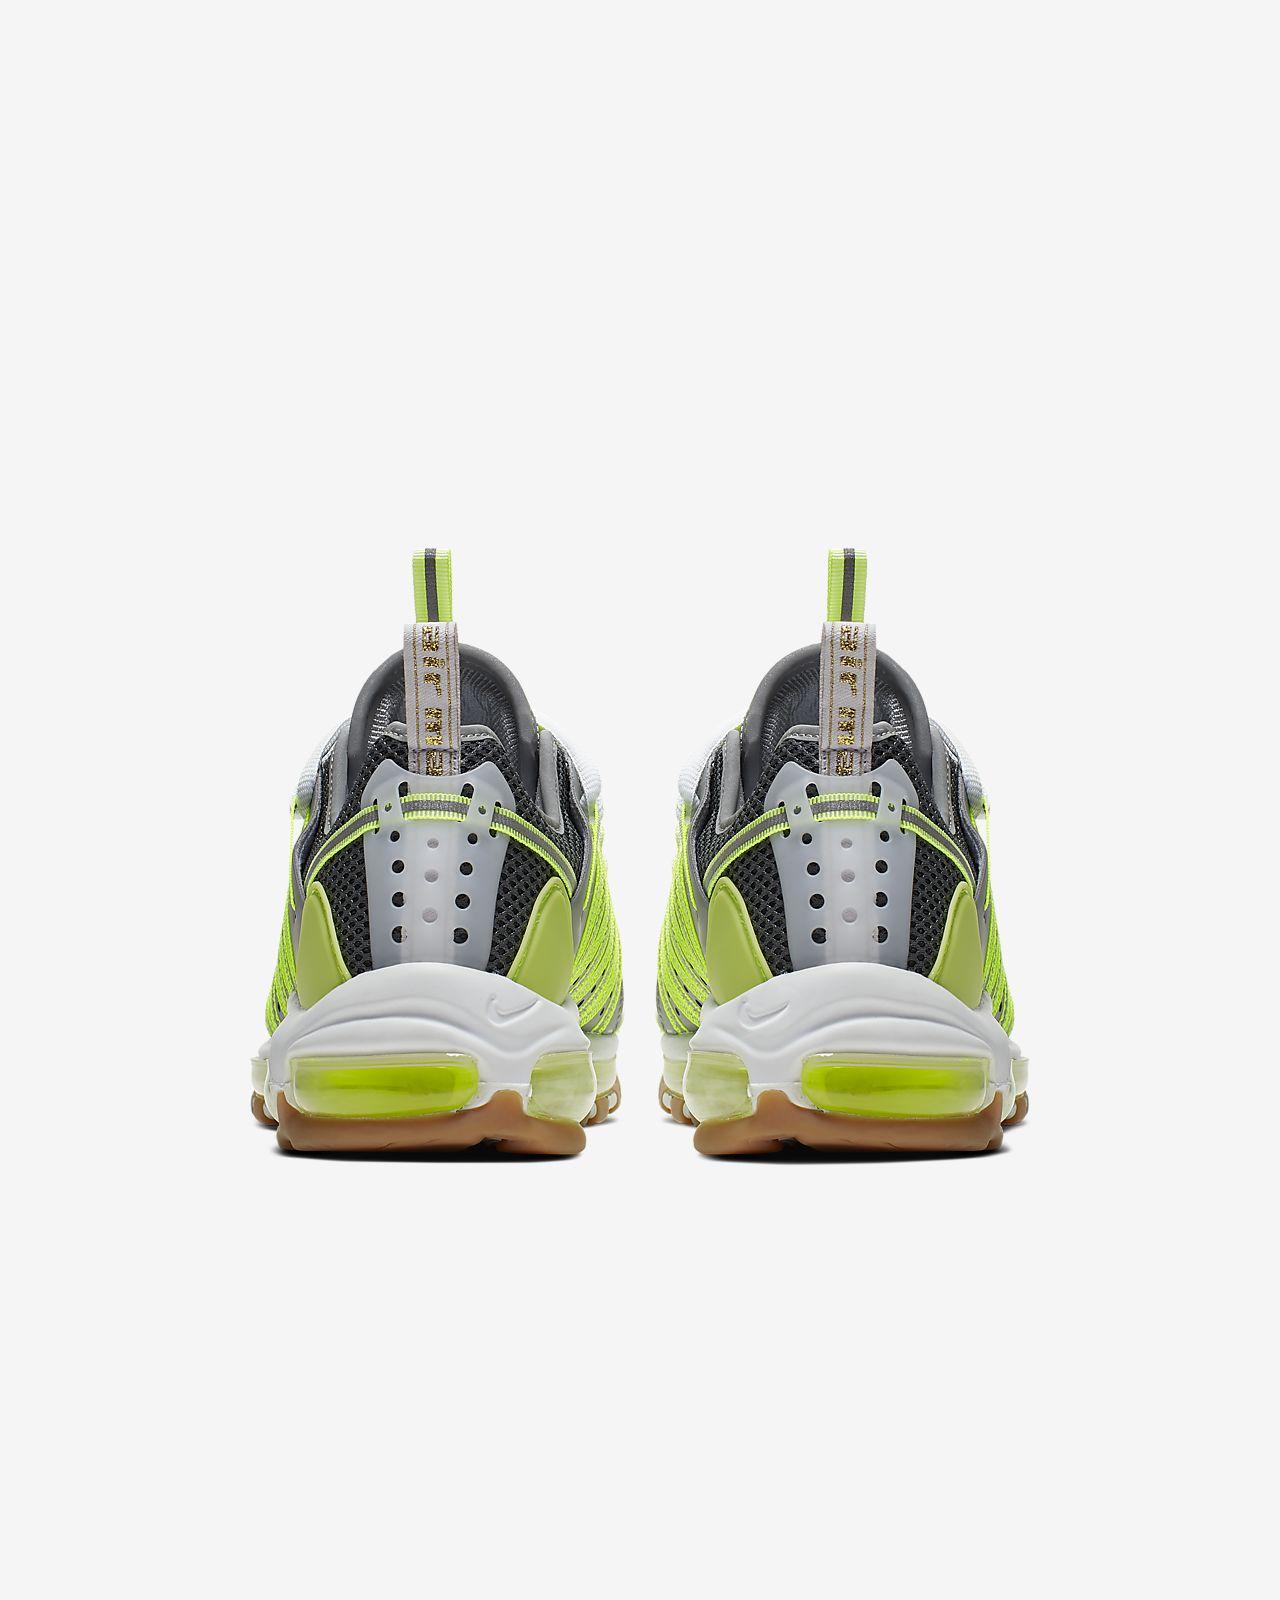 Nike x CLOT Air Max Haven sko til herre